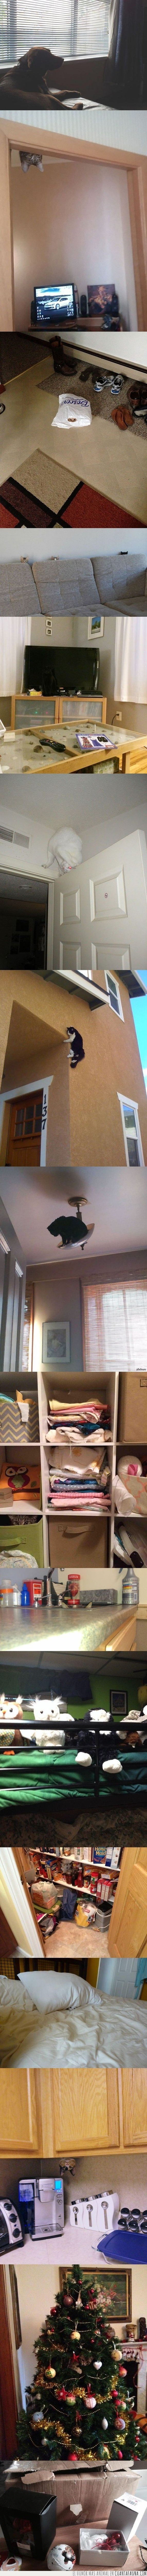 escondidos,gatos,ninja